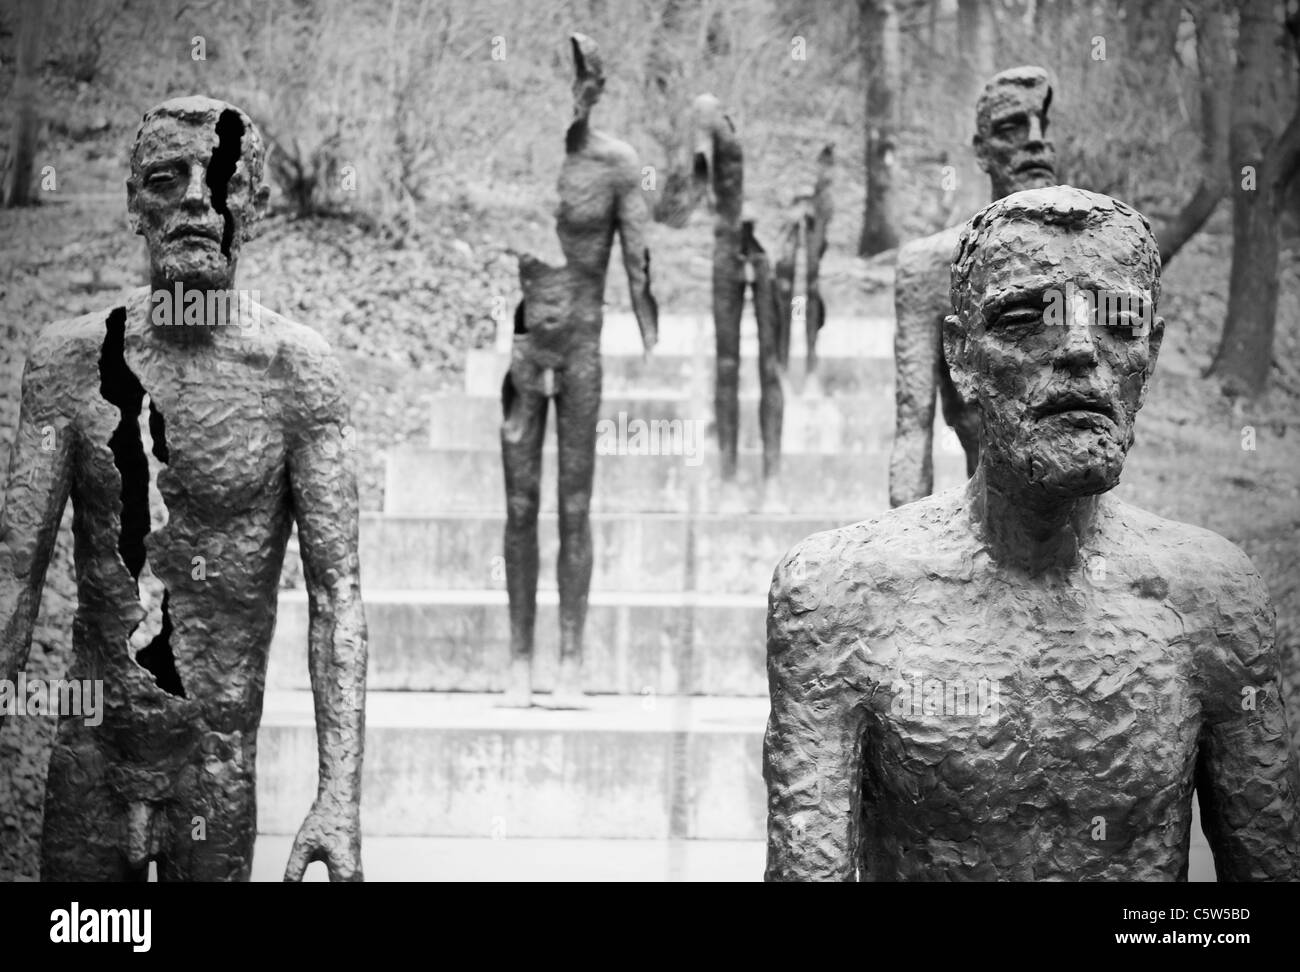 Czechoslovakia, Prague, Victims of Communism memorial - Stock Image